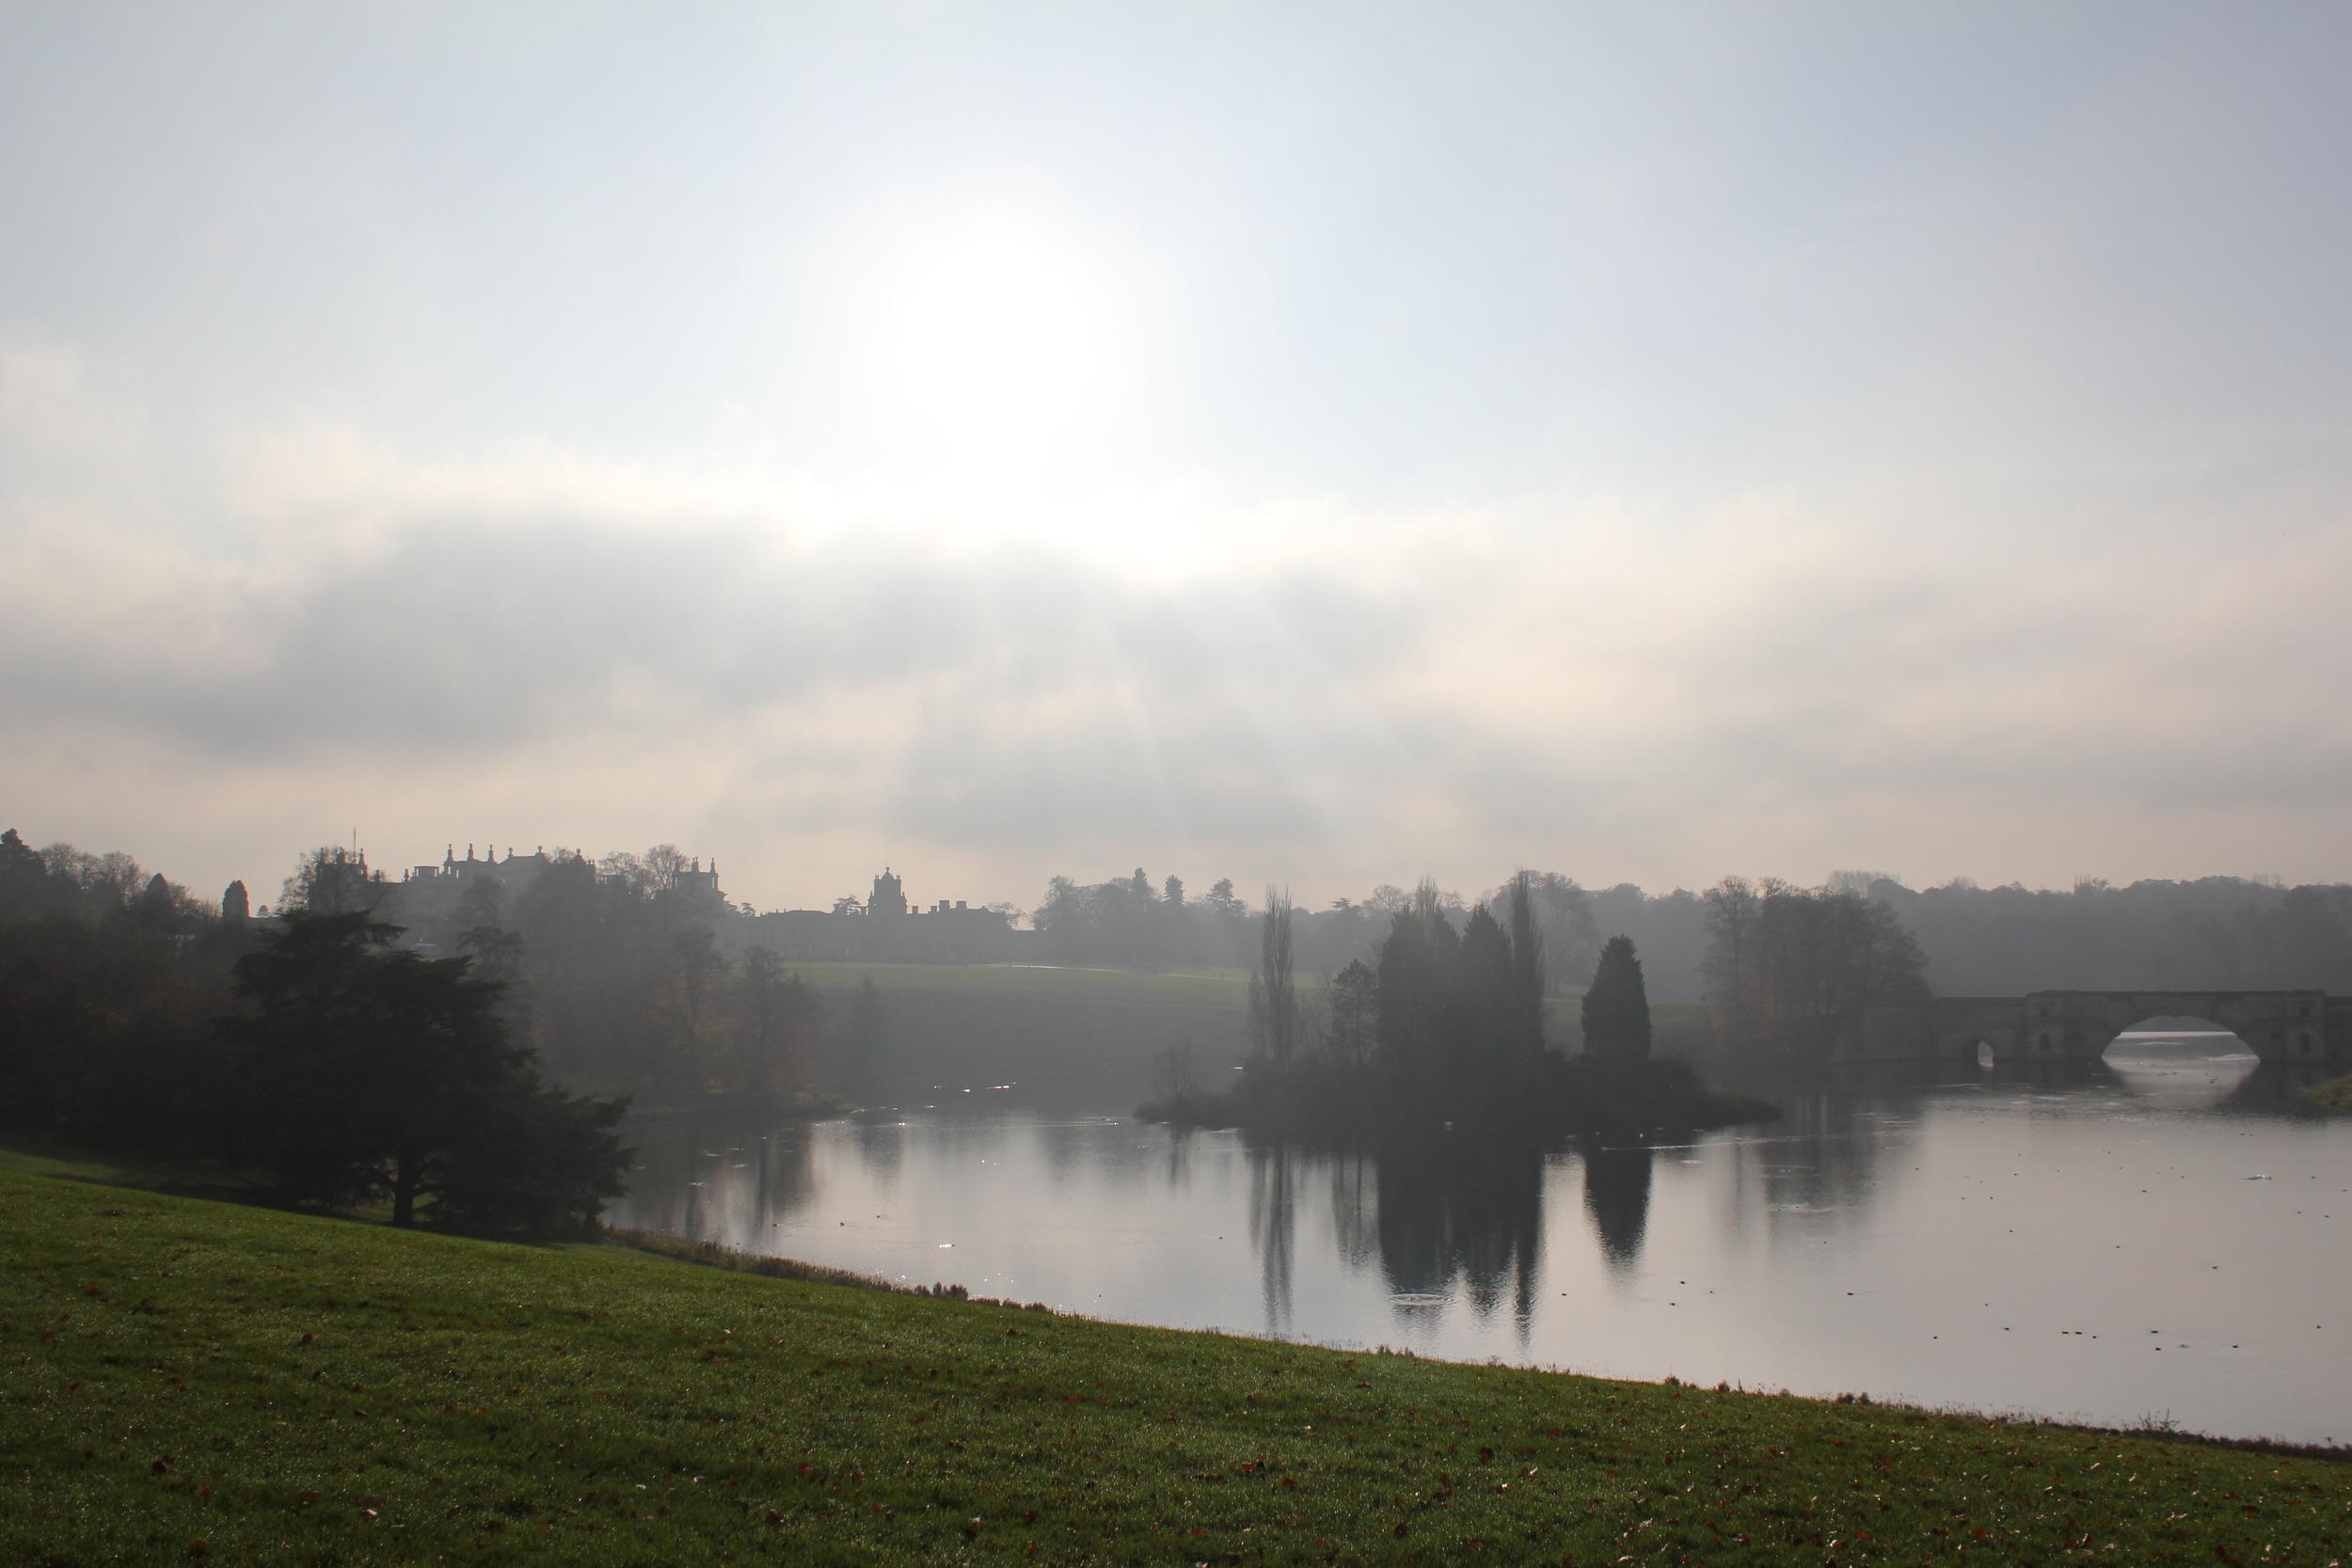 Blenheim Palace, Oxfordshire, England